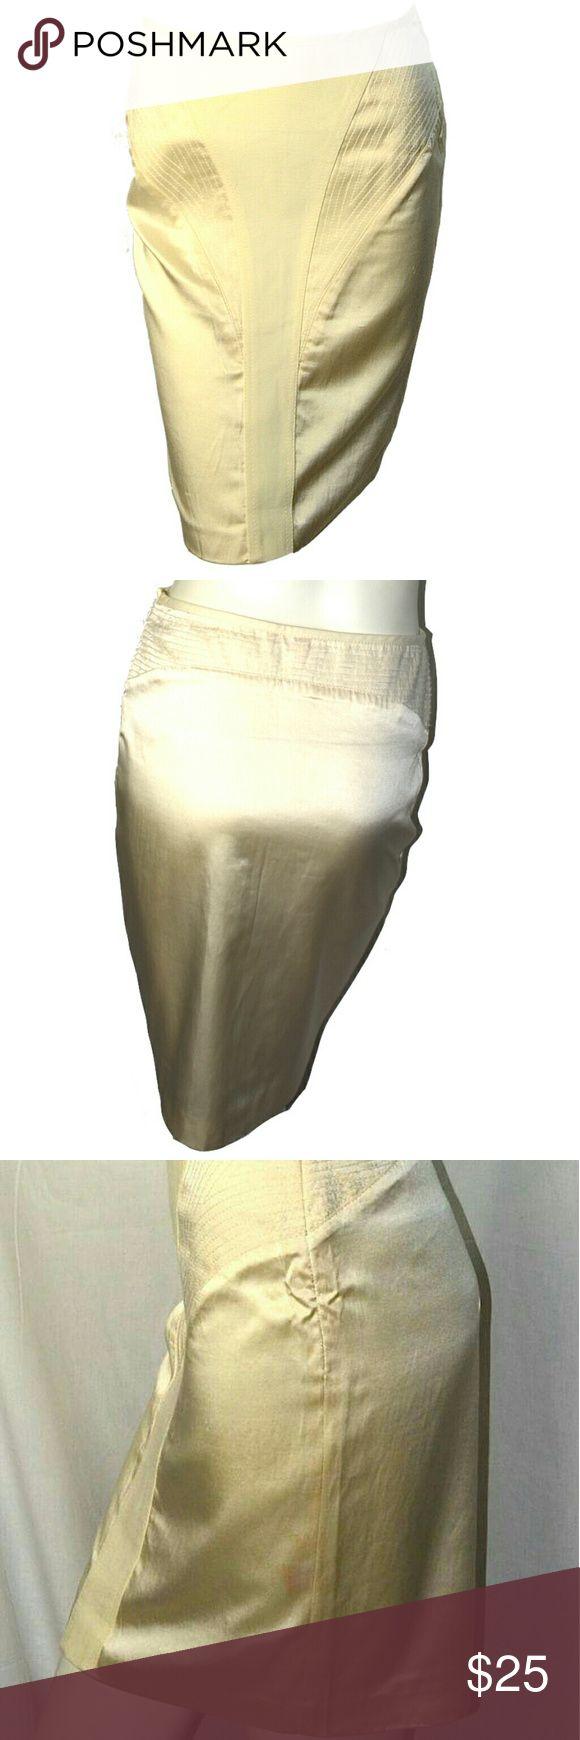 Silk Catherine Malandrino skirt with racer lines Silk Catherine Malandrino skirt with racer lines Catherine Malandrino Tops